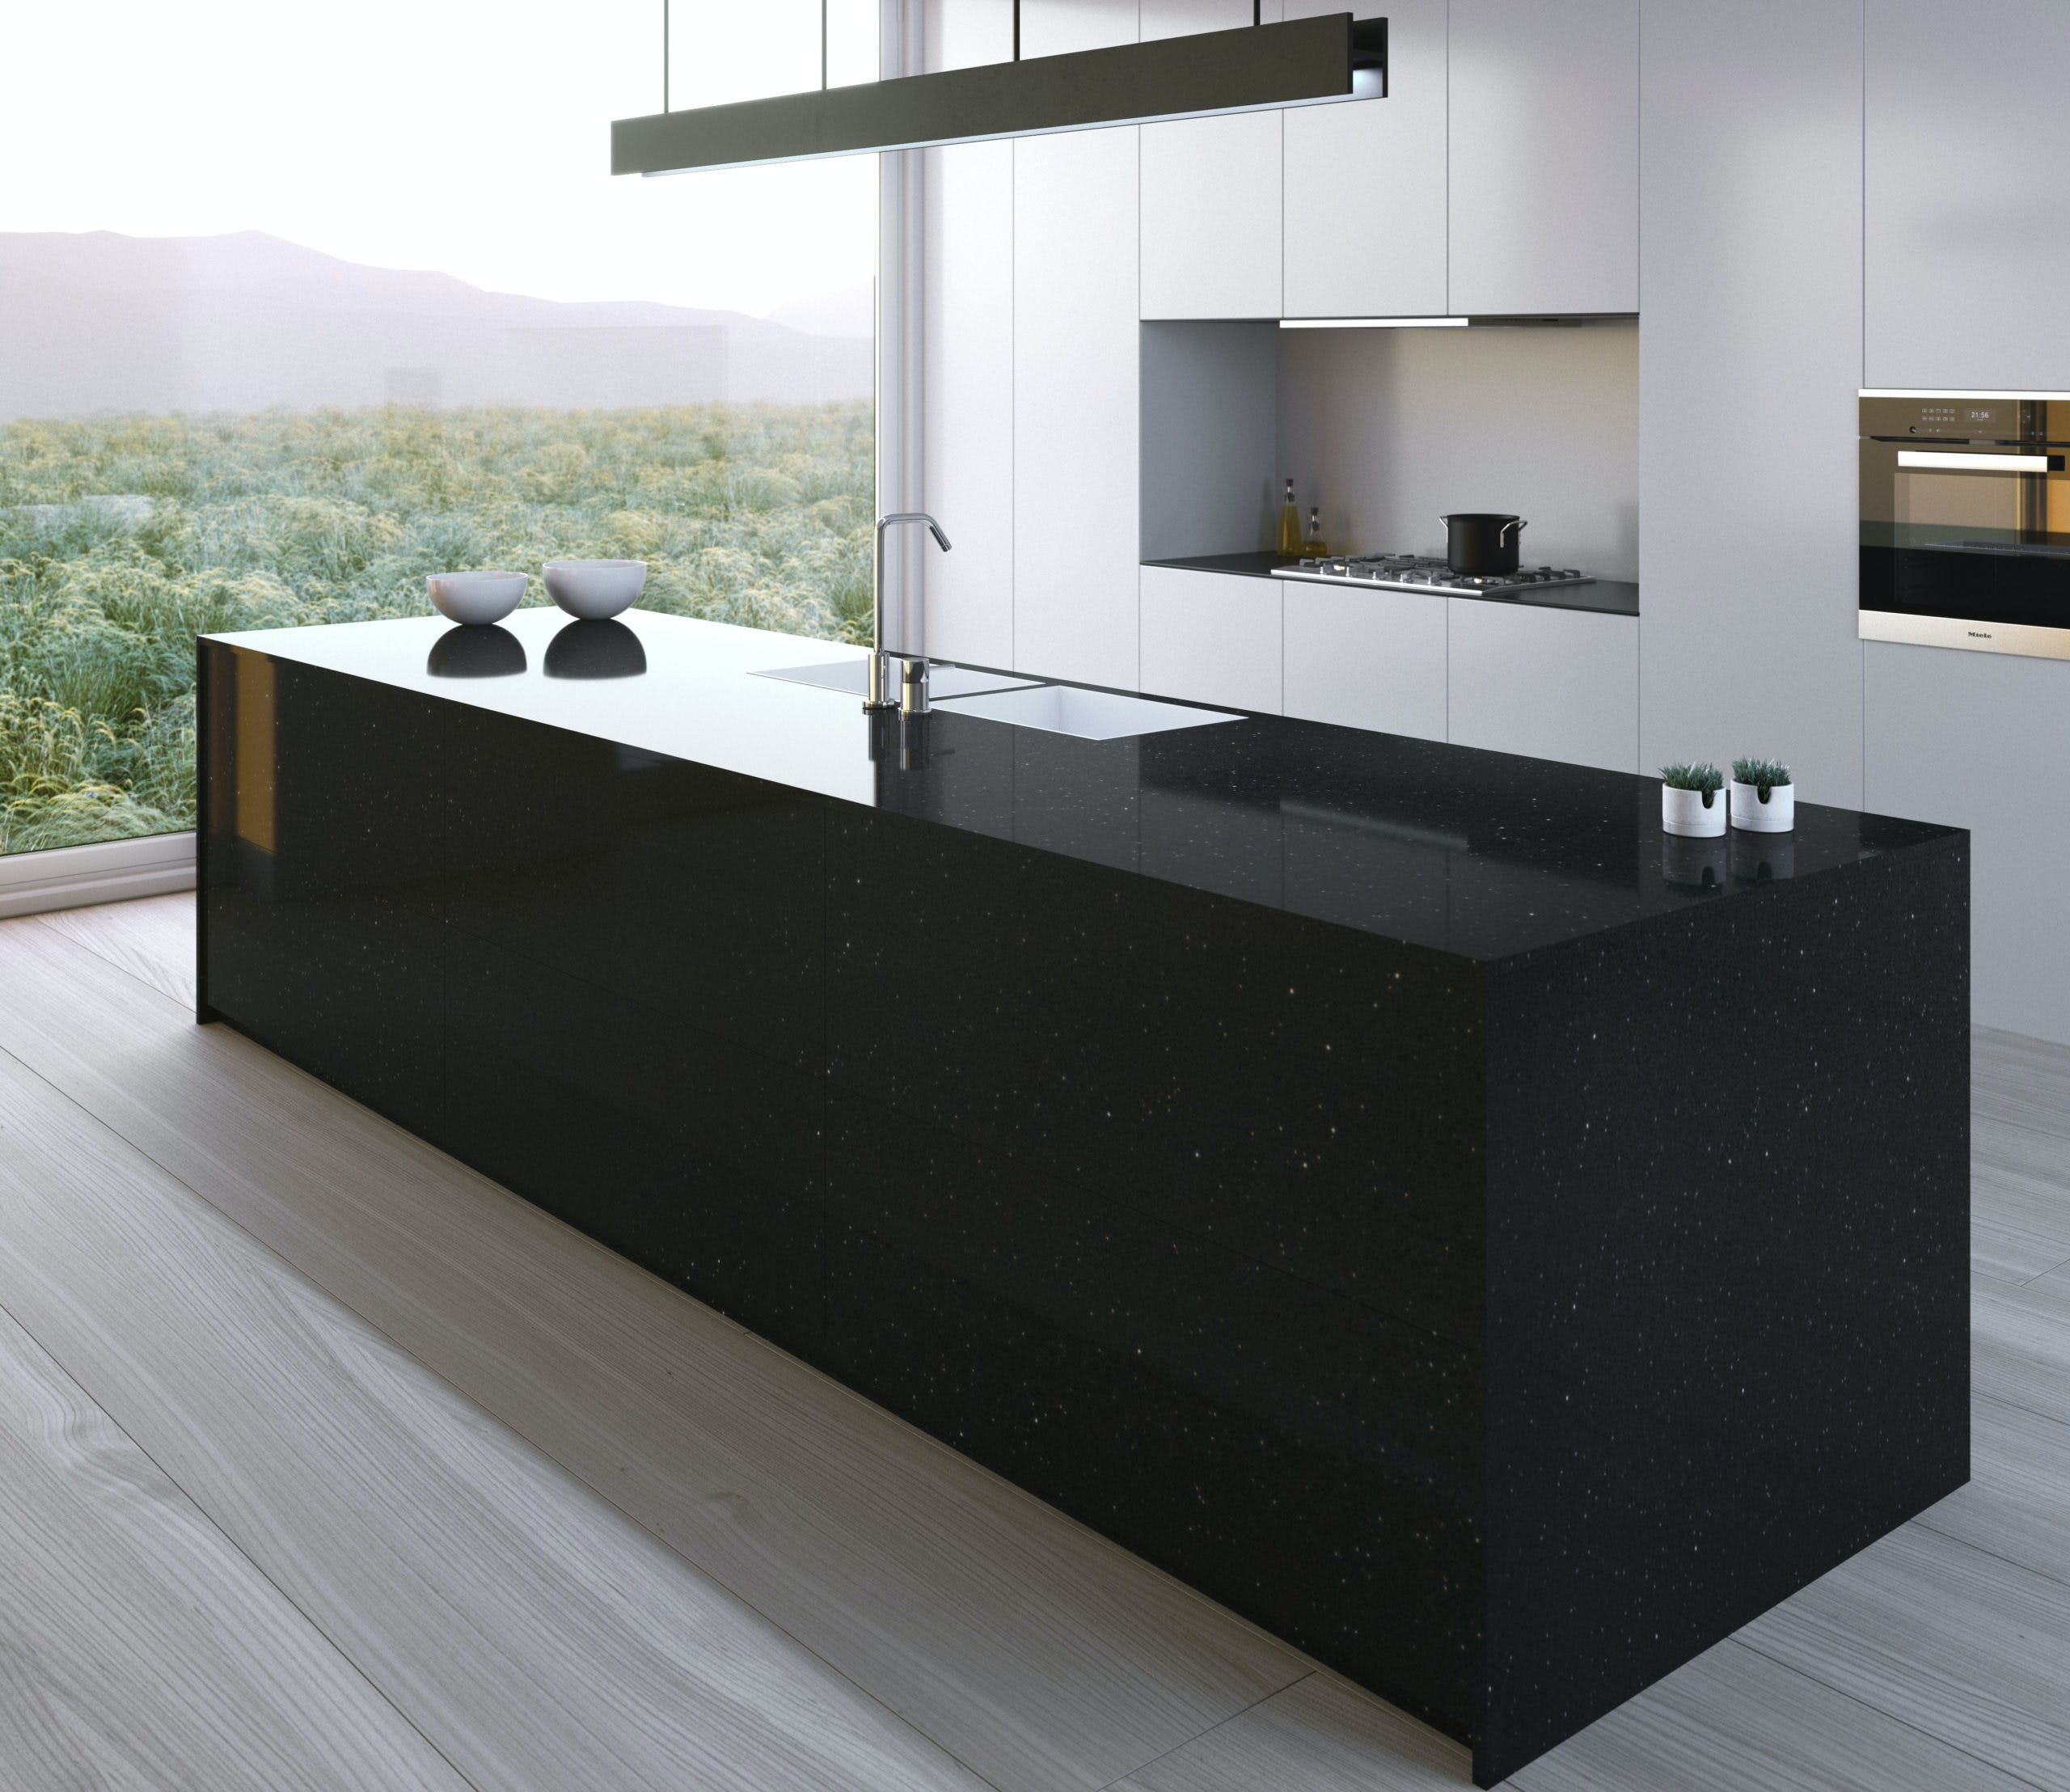 Image of Silestone Kitchen Negro Stellar 2 scaled 1 in Cuisine, Design and Culture: Silestone® and Feroz Awards 2021 - Cosentino